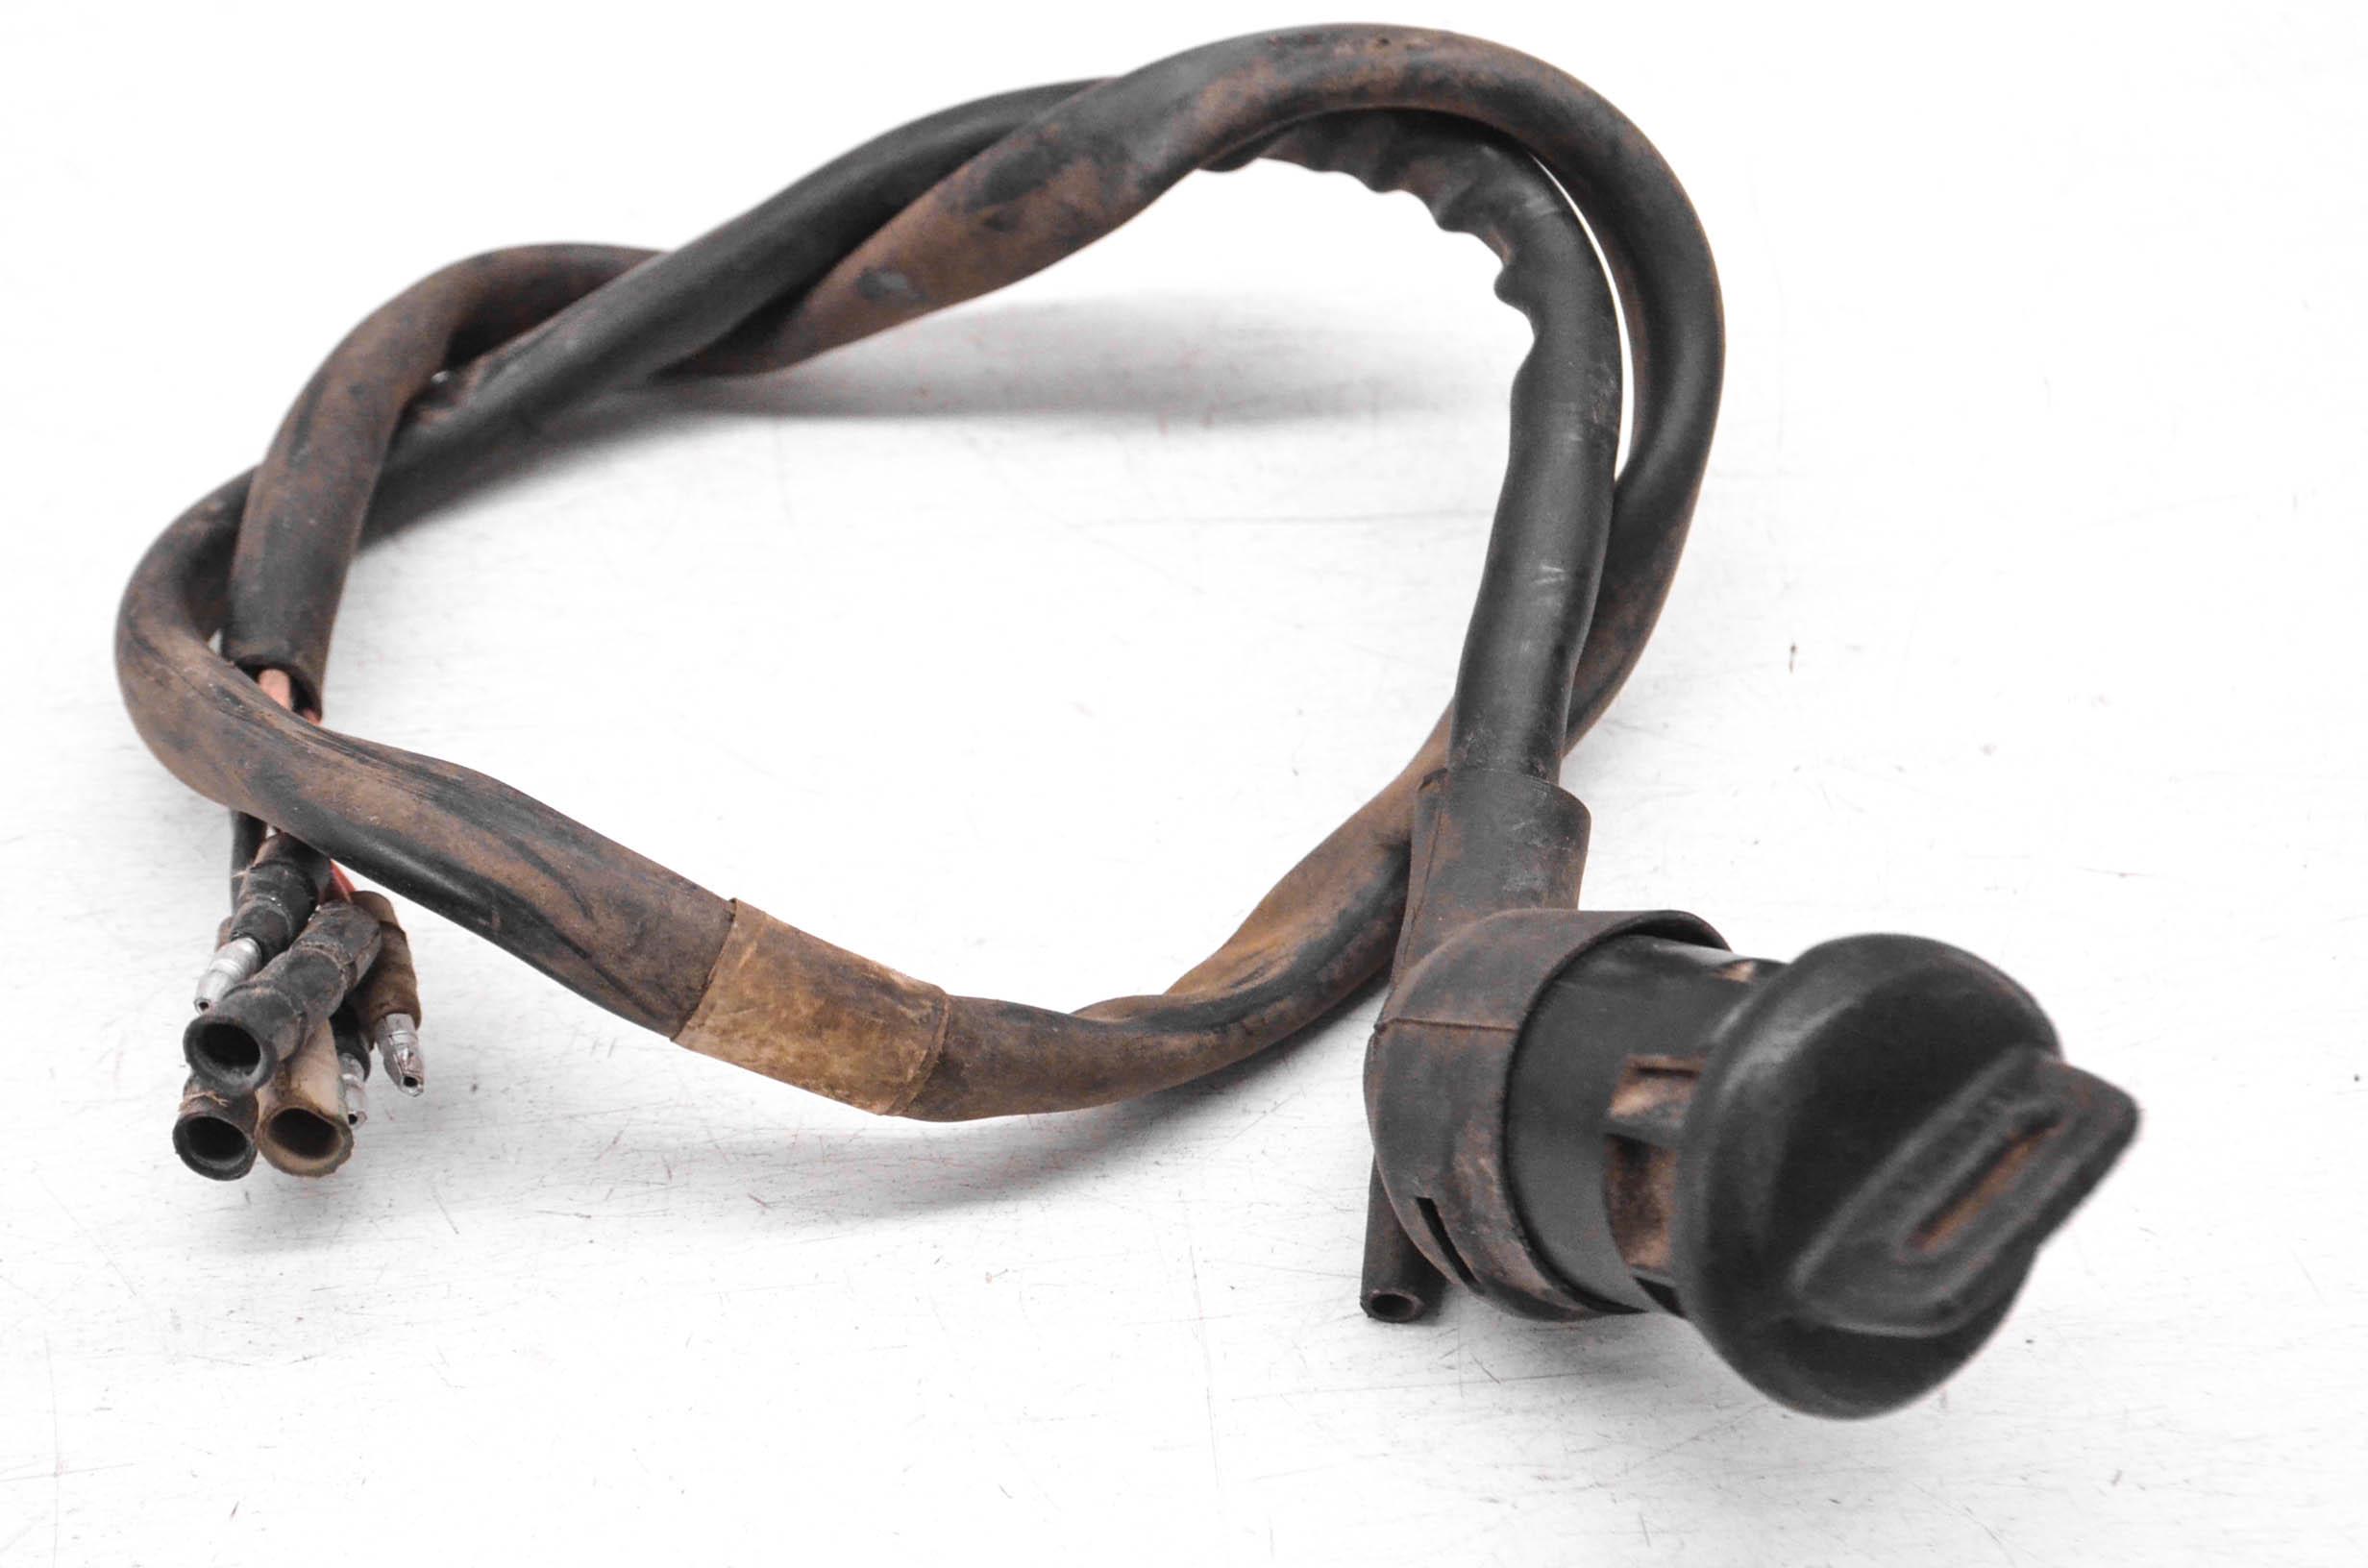 For Honda FourTrax 350 Ignition key switch 86 87 ATV#F57 GOOD!!